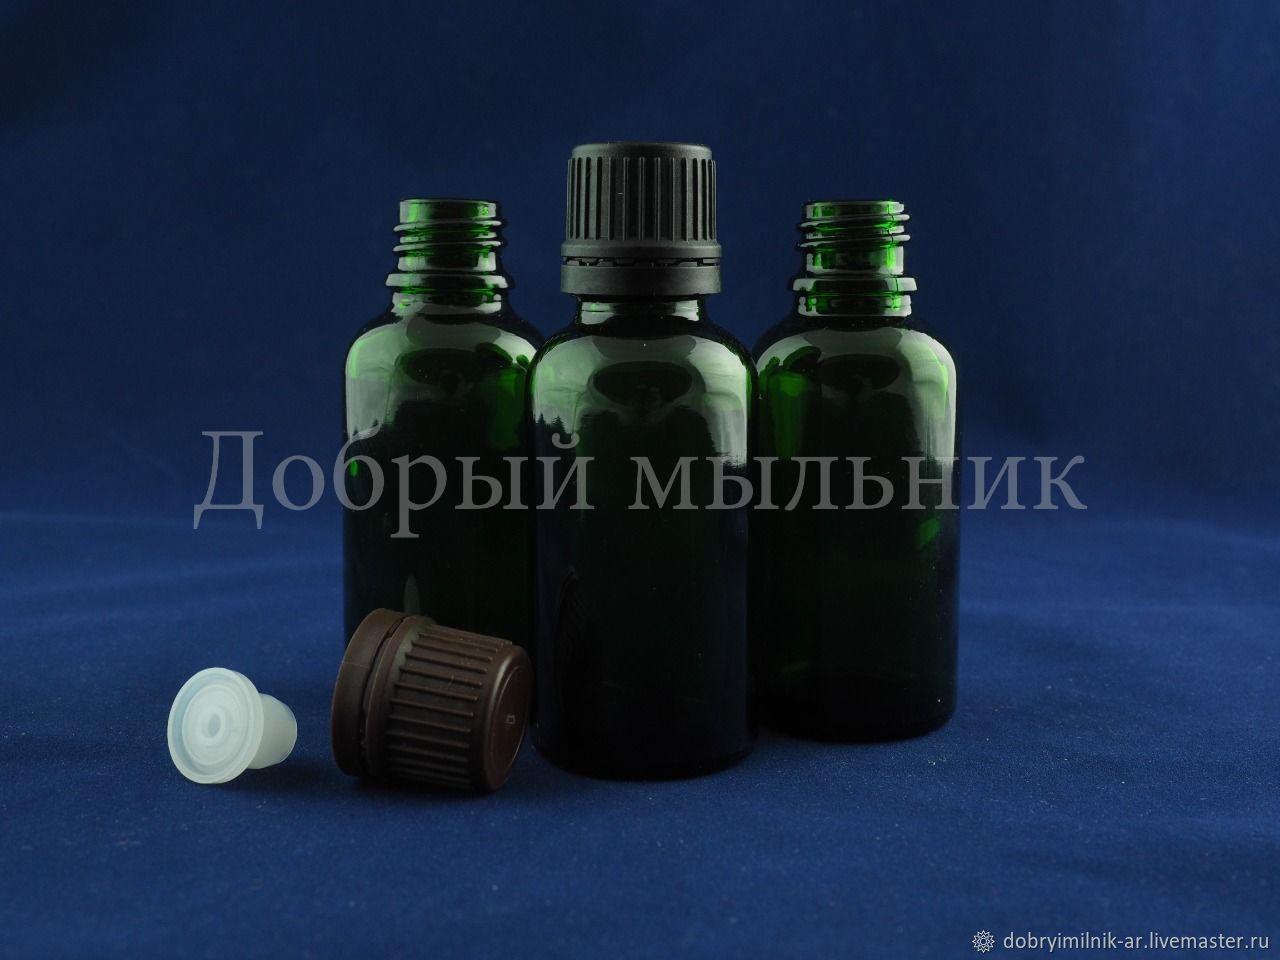 Флакон 50 мл стекло зеленый, Флаконы, Москва,  Фото №1